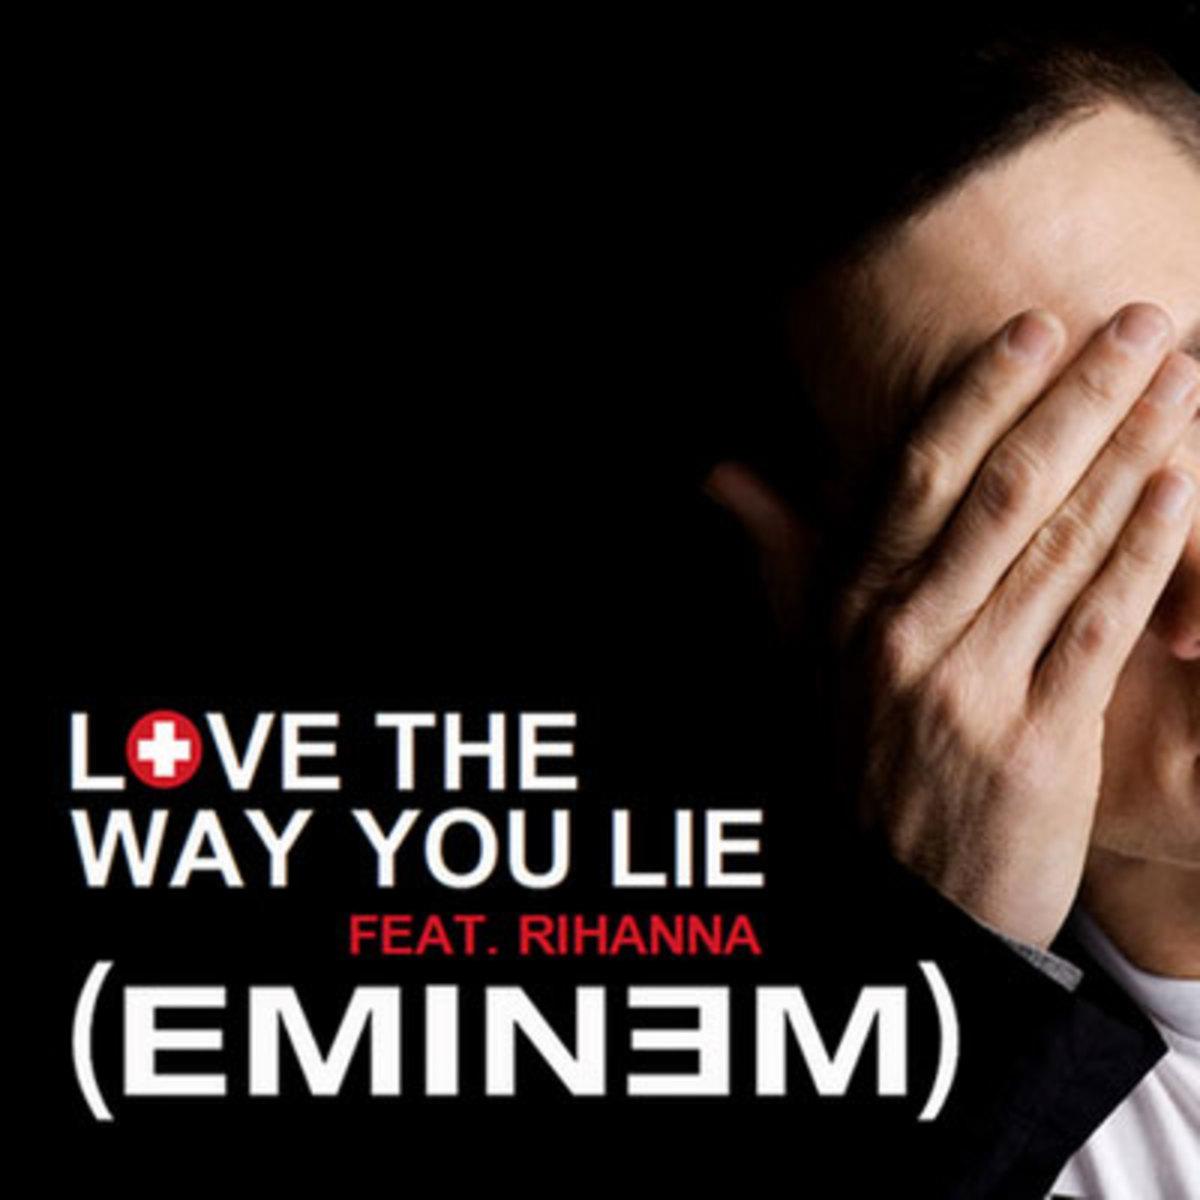 eminem-lovethewayyoulie.jpg